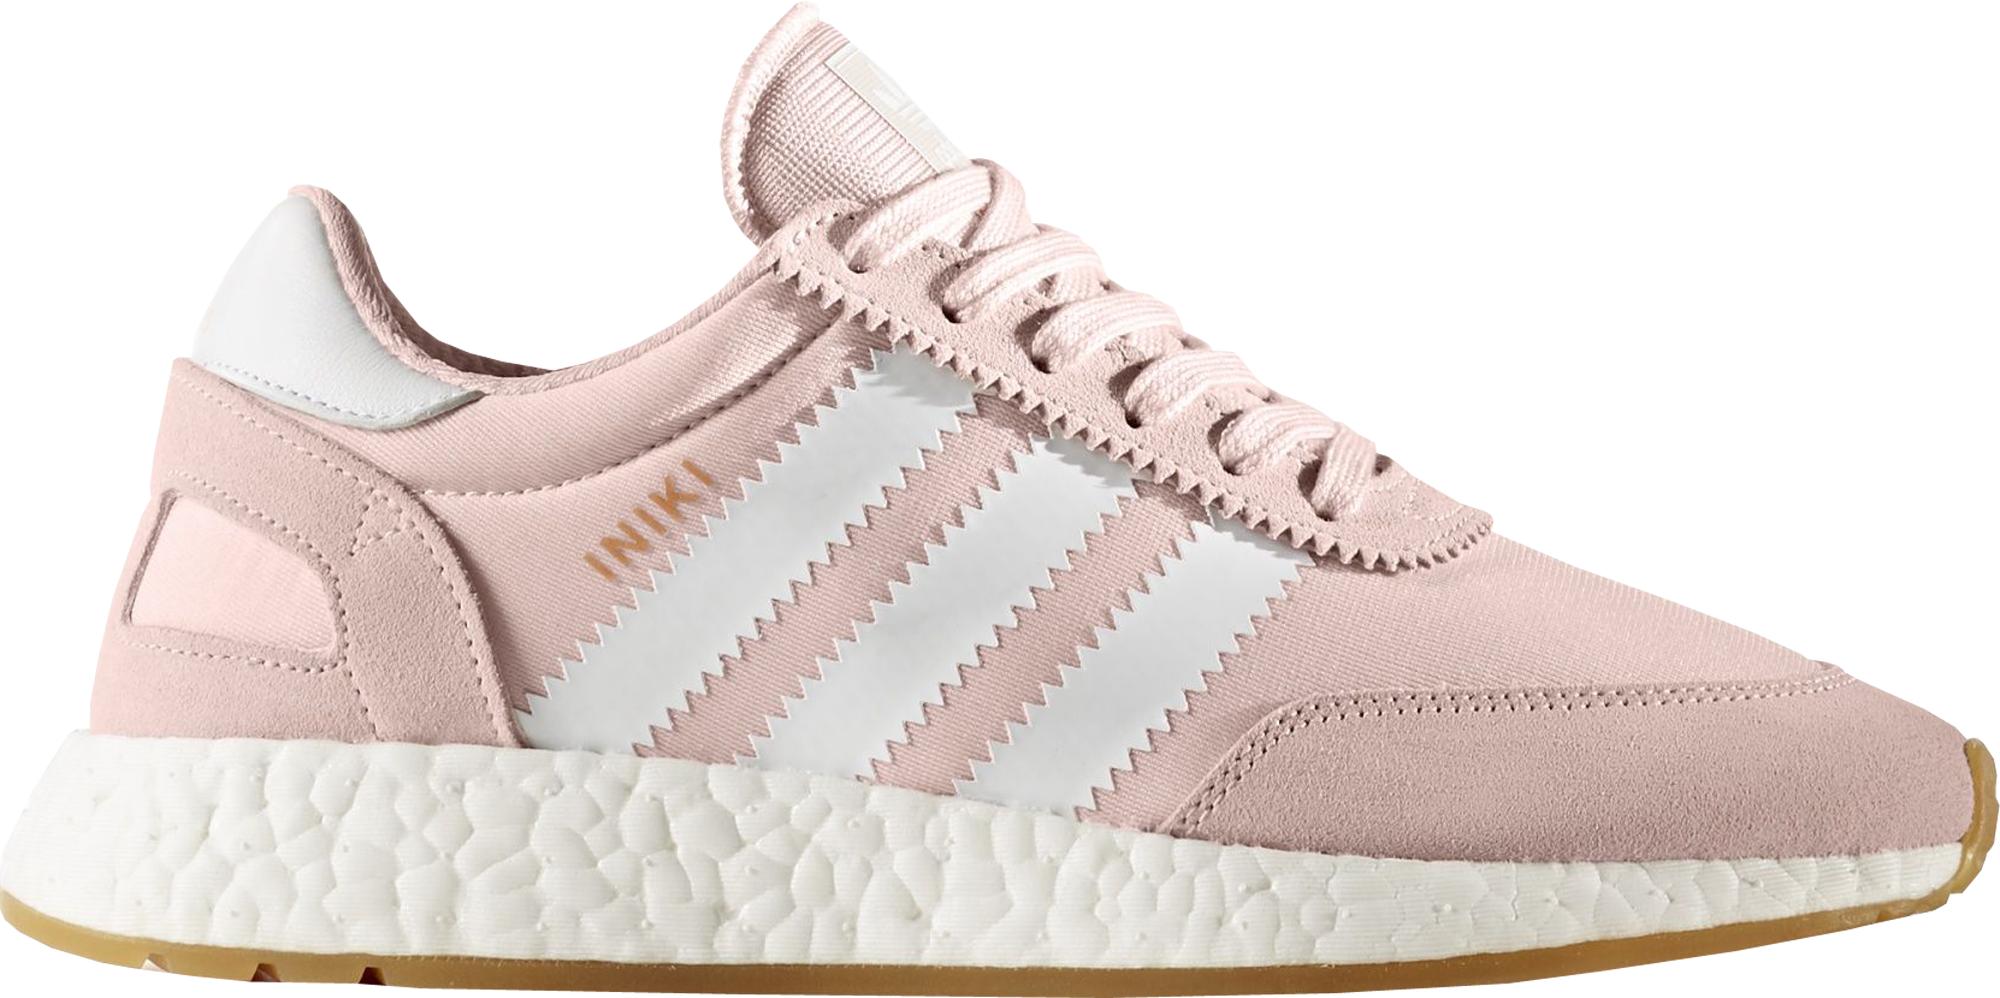 adidas Iniki Runner Icey Pink (W)